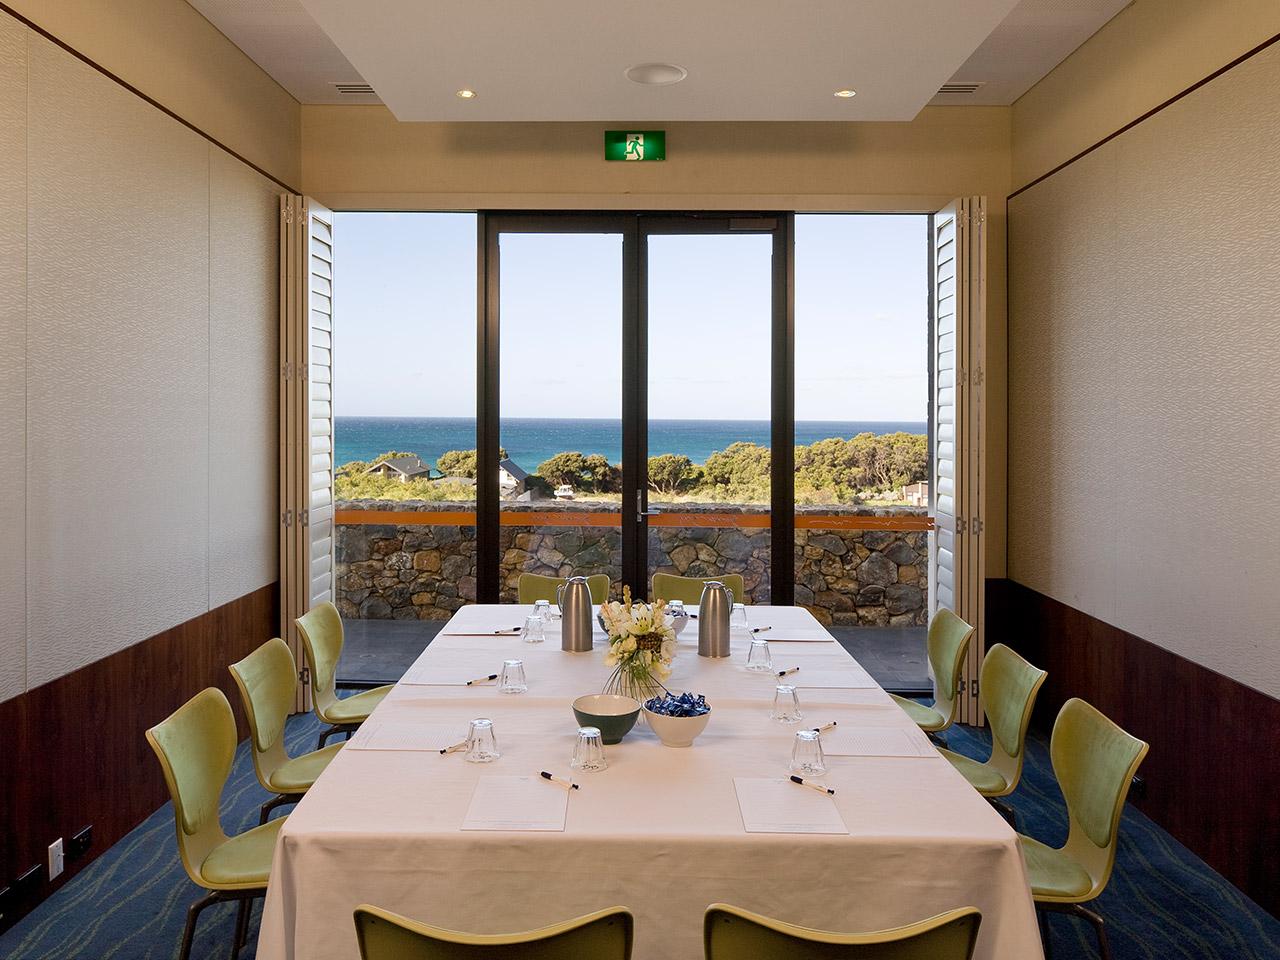 Meeting Room With Ocean View